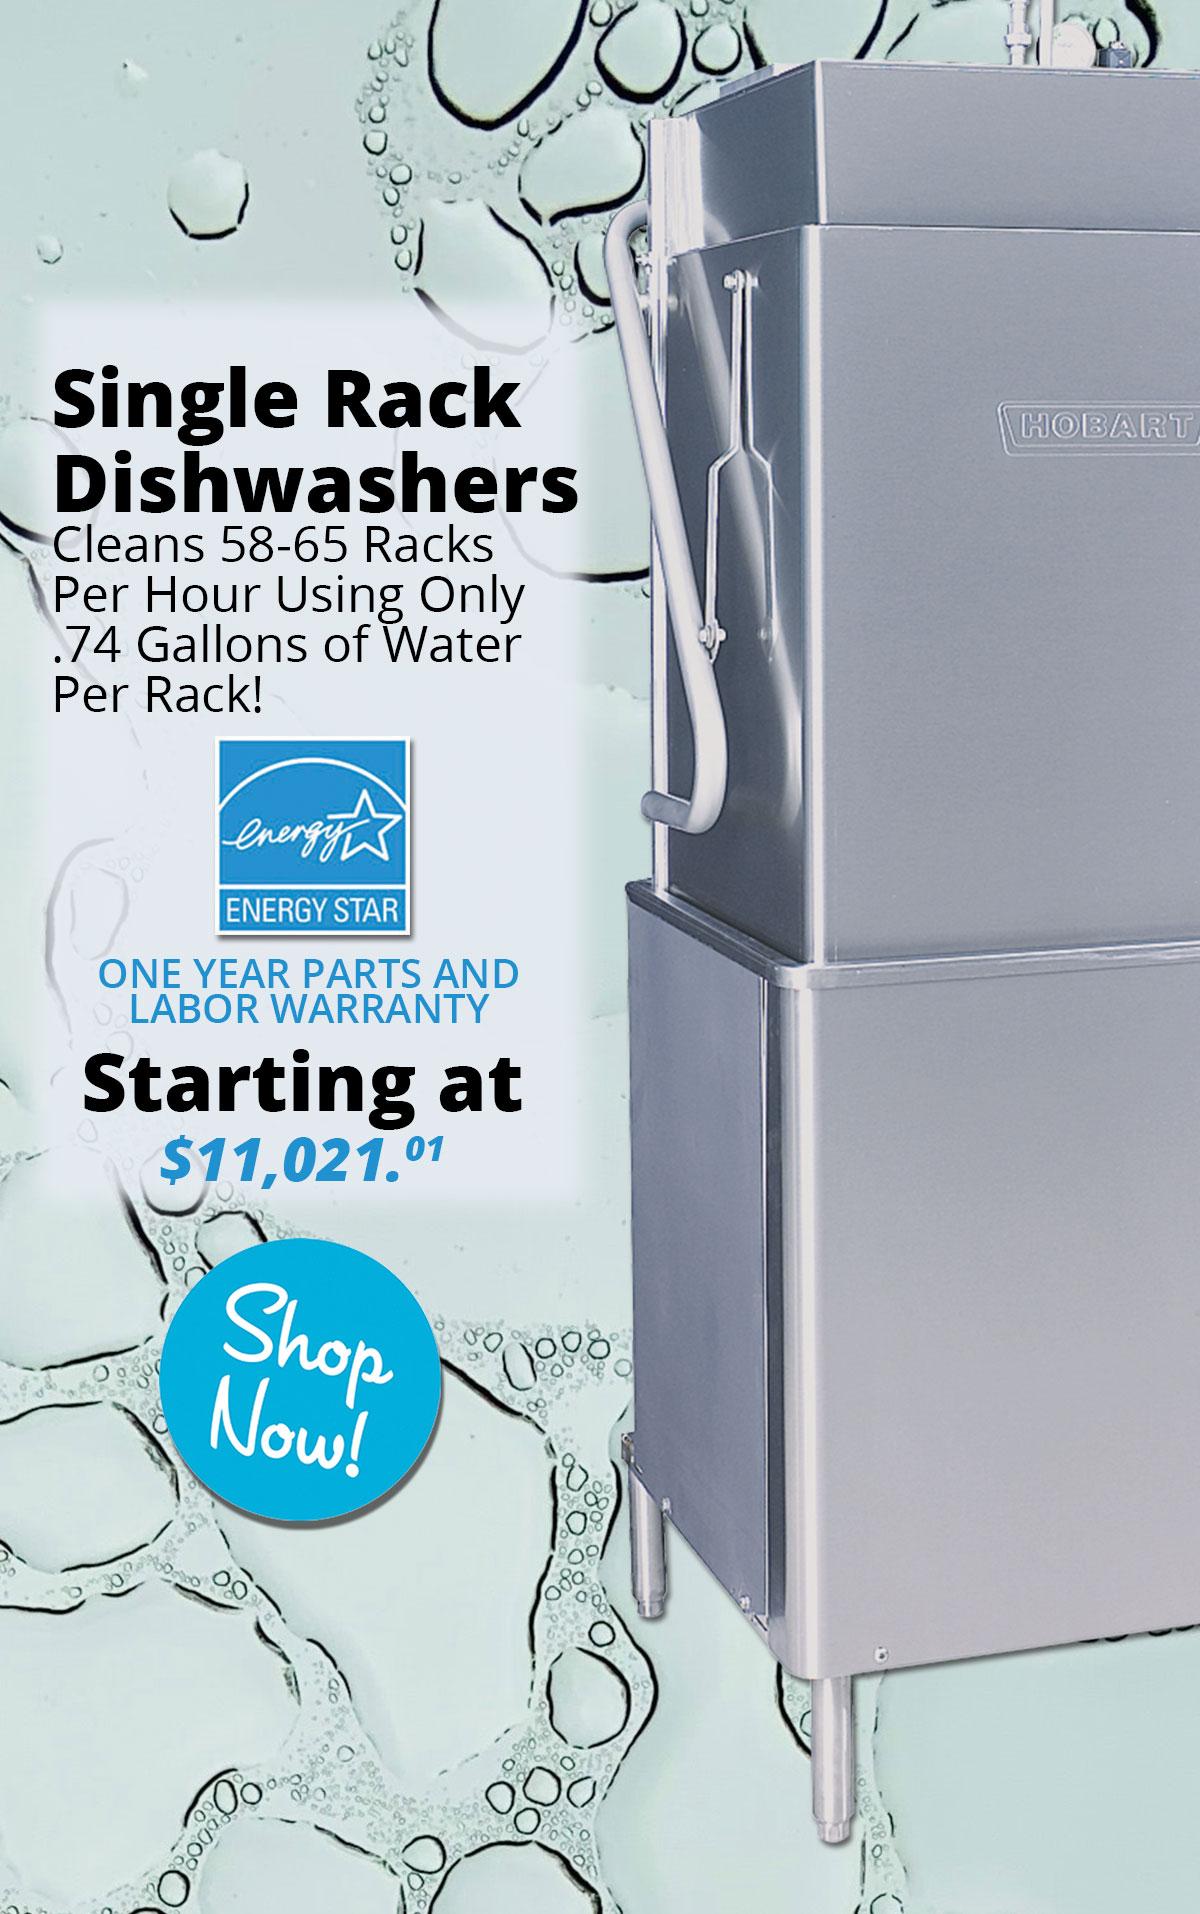 Hobart Single Rack Dishwashers starting at $11,020.01